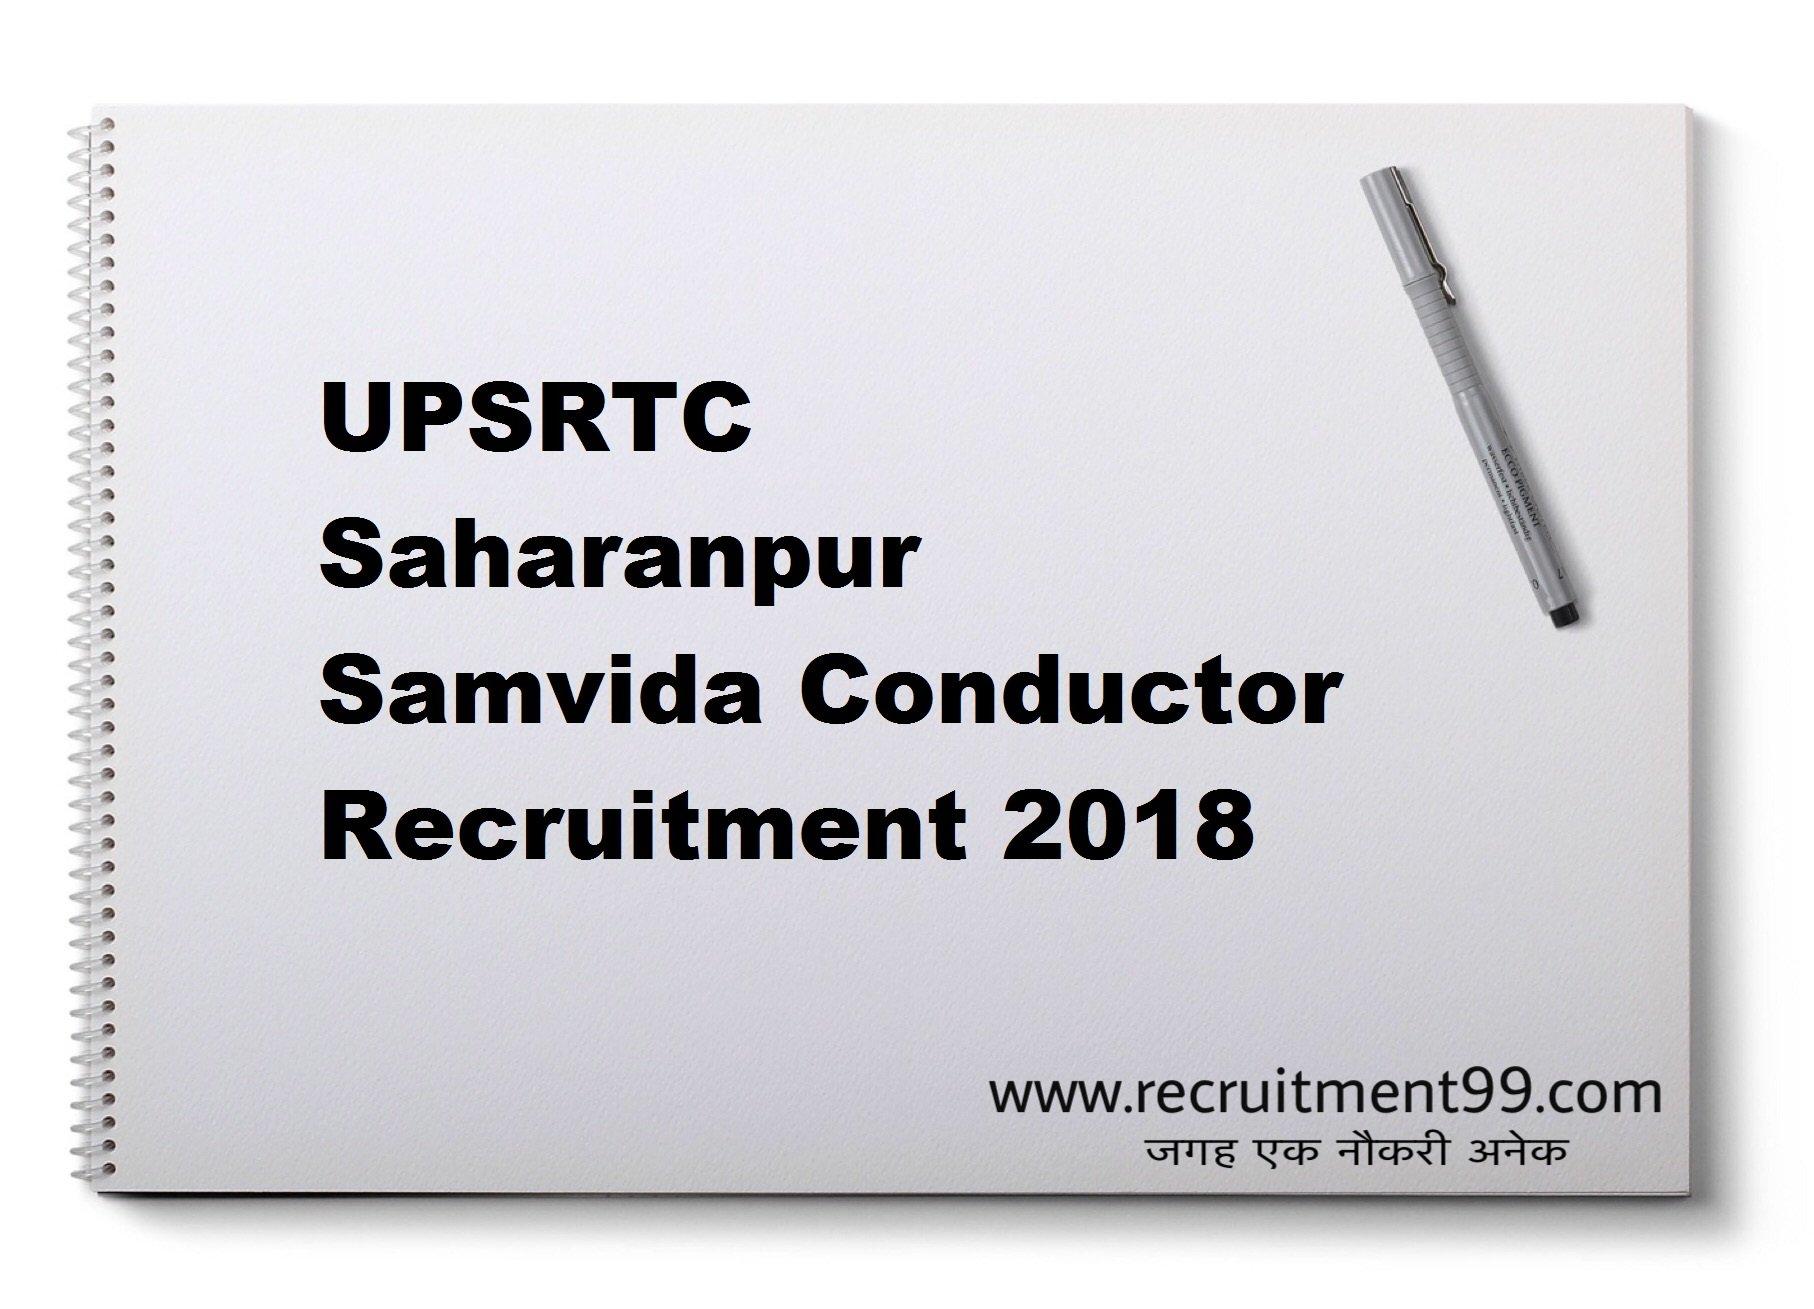 UPSRTC Saharanpur Samvida Conductor Recruitment Admit Card Result 2018